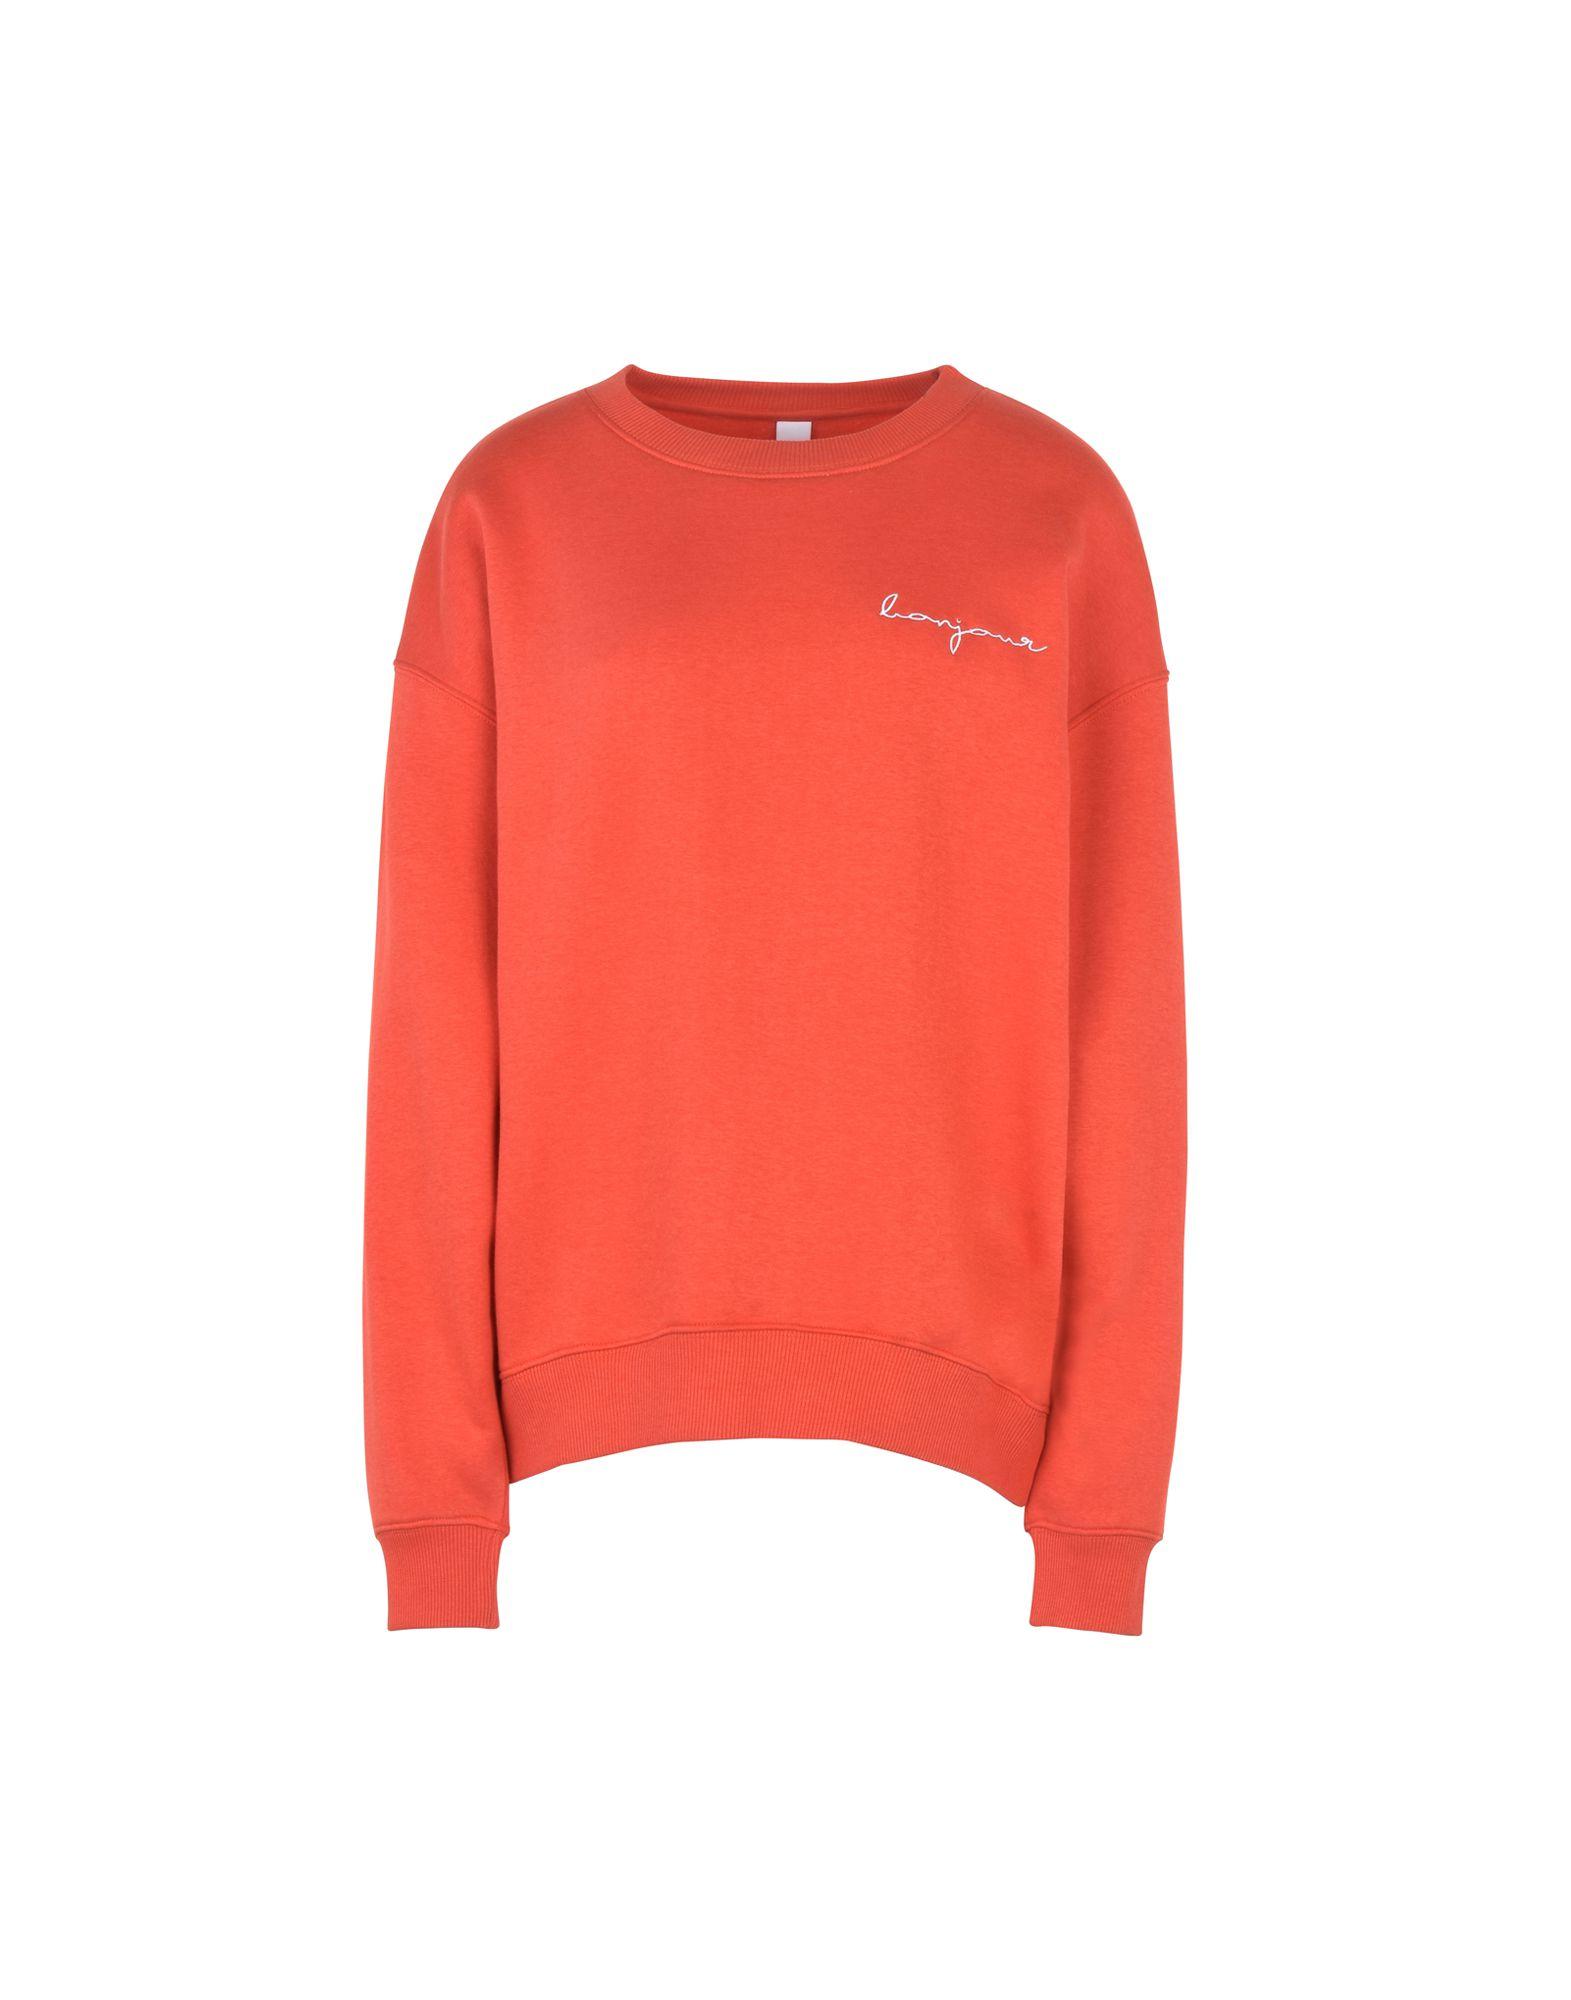 MBYM Sweatshirt in Red